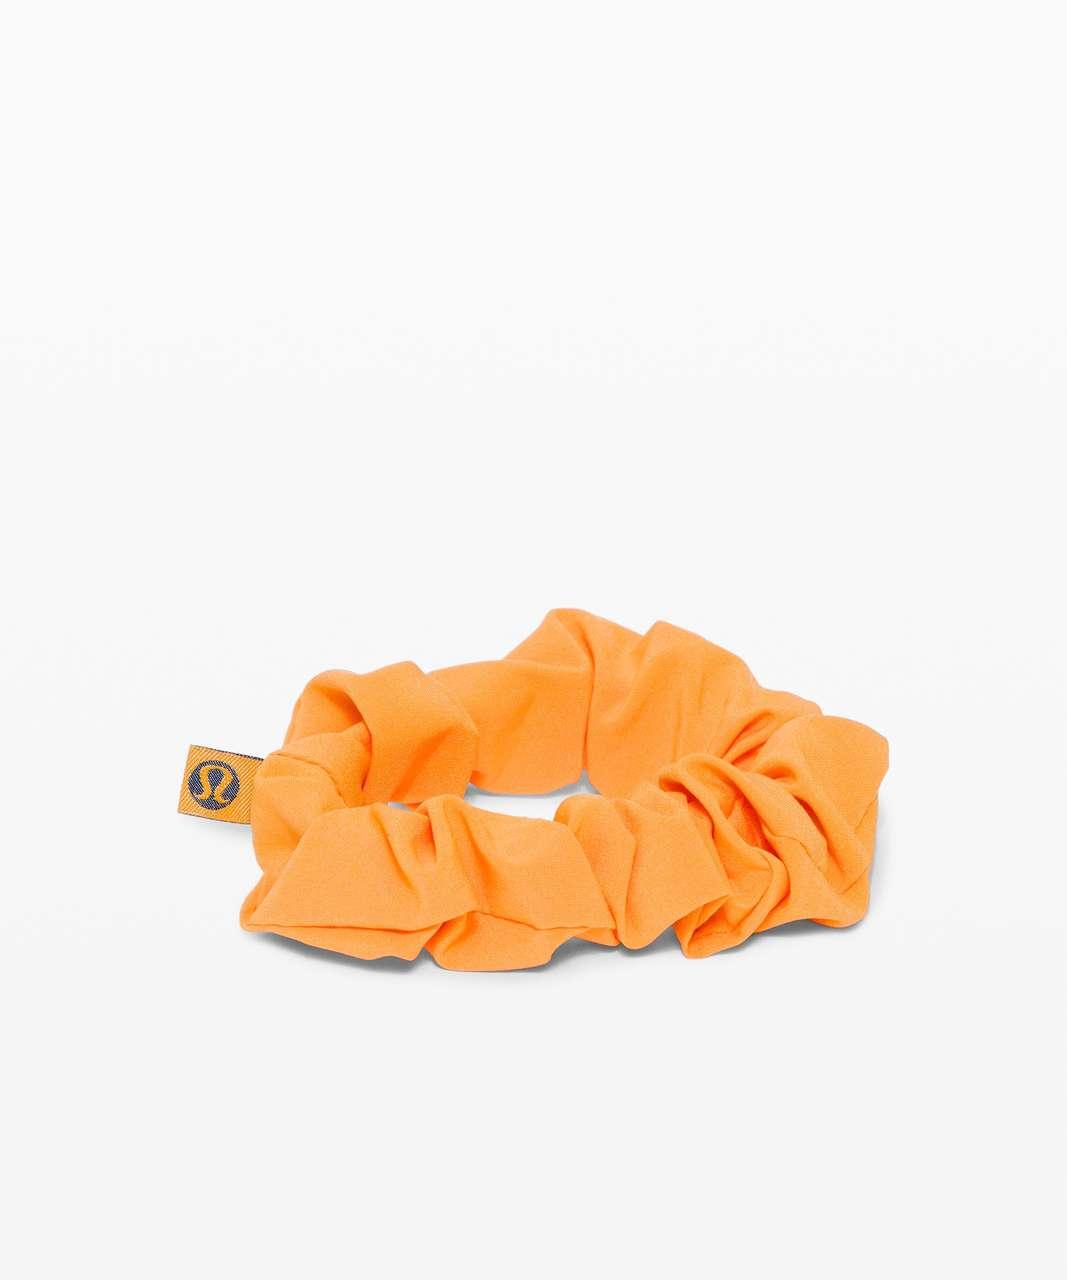 Lululemon Uplifting Scrunchie - Tiger